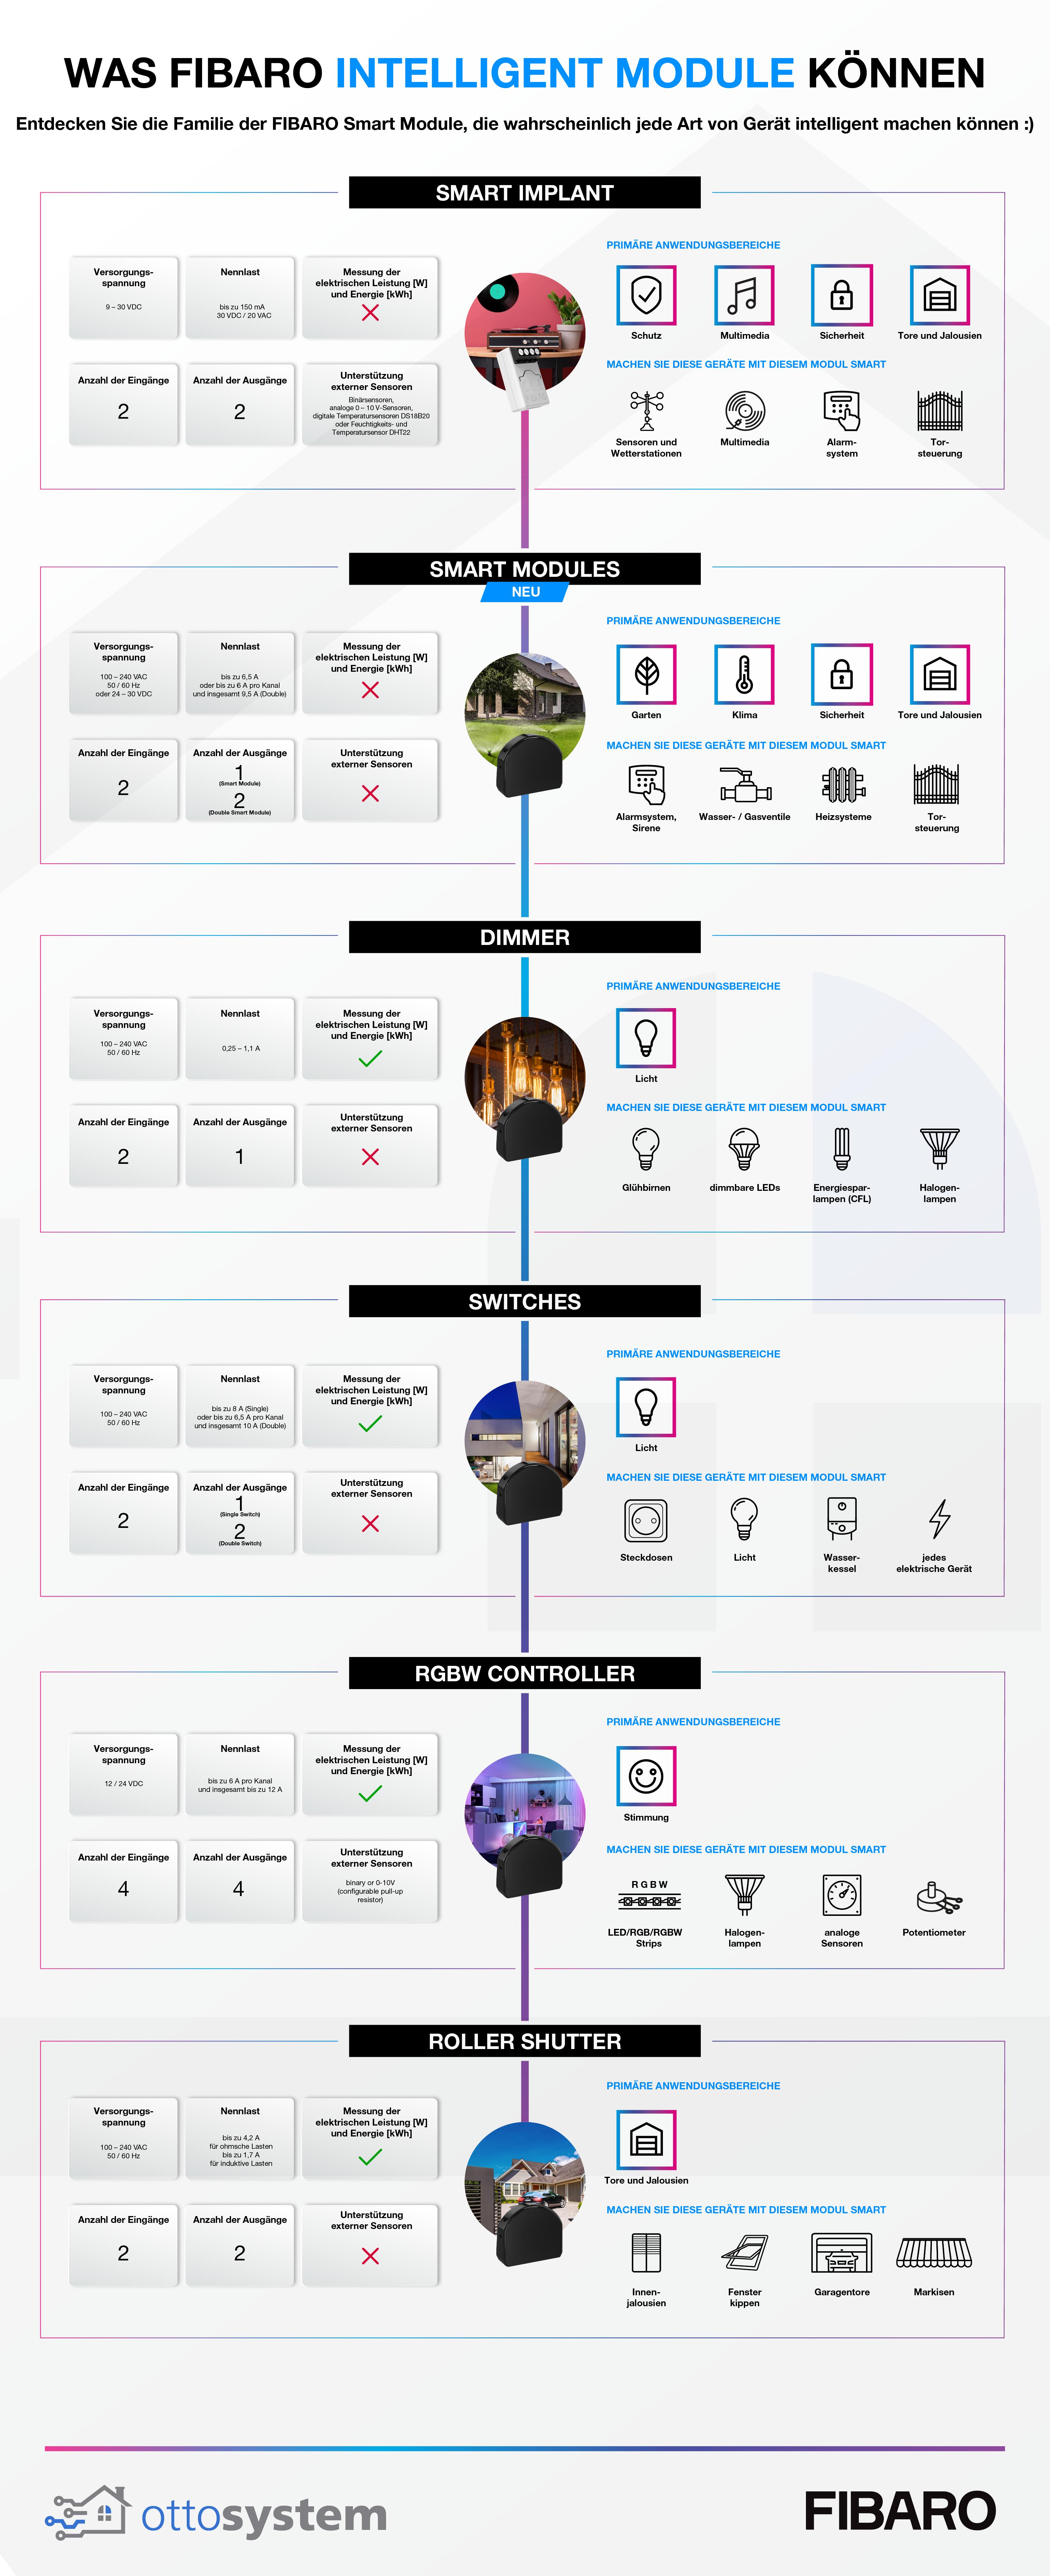 FIBARO-modules_Infografik_ottosystem